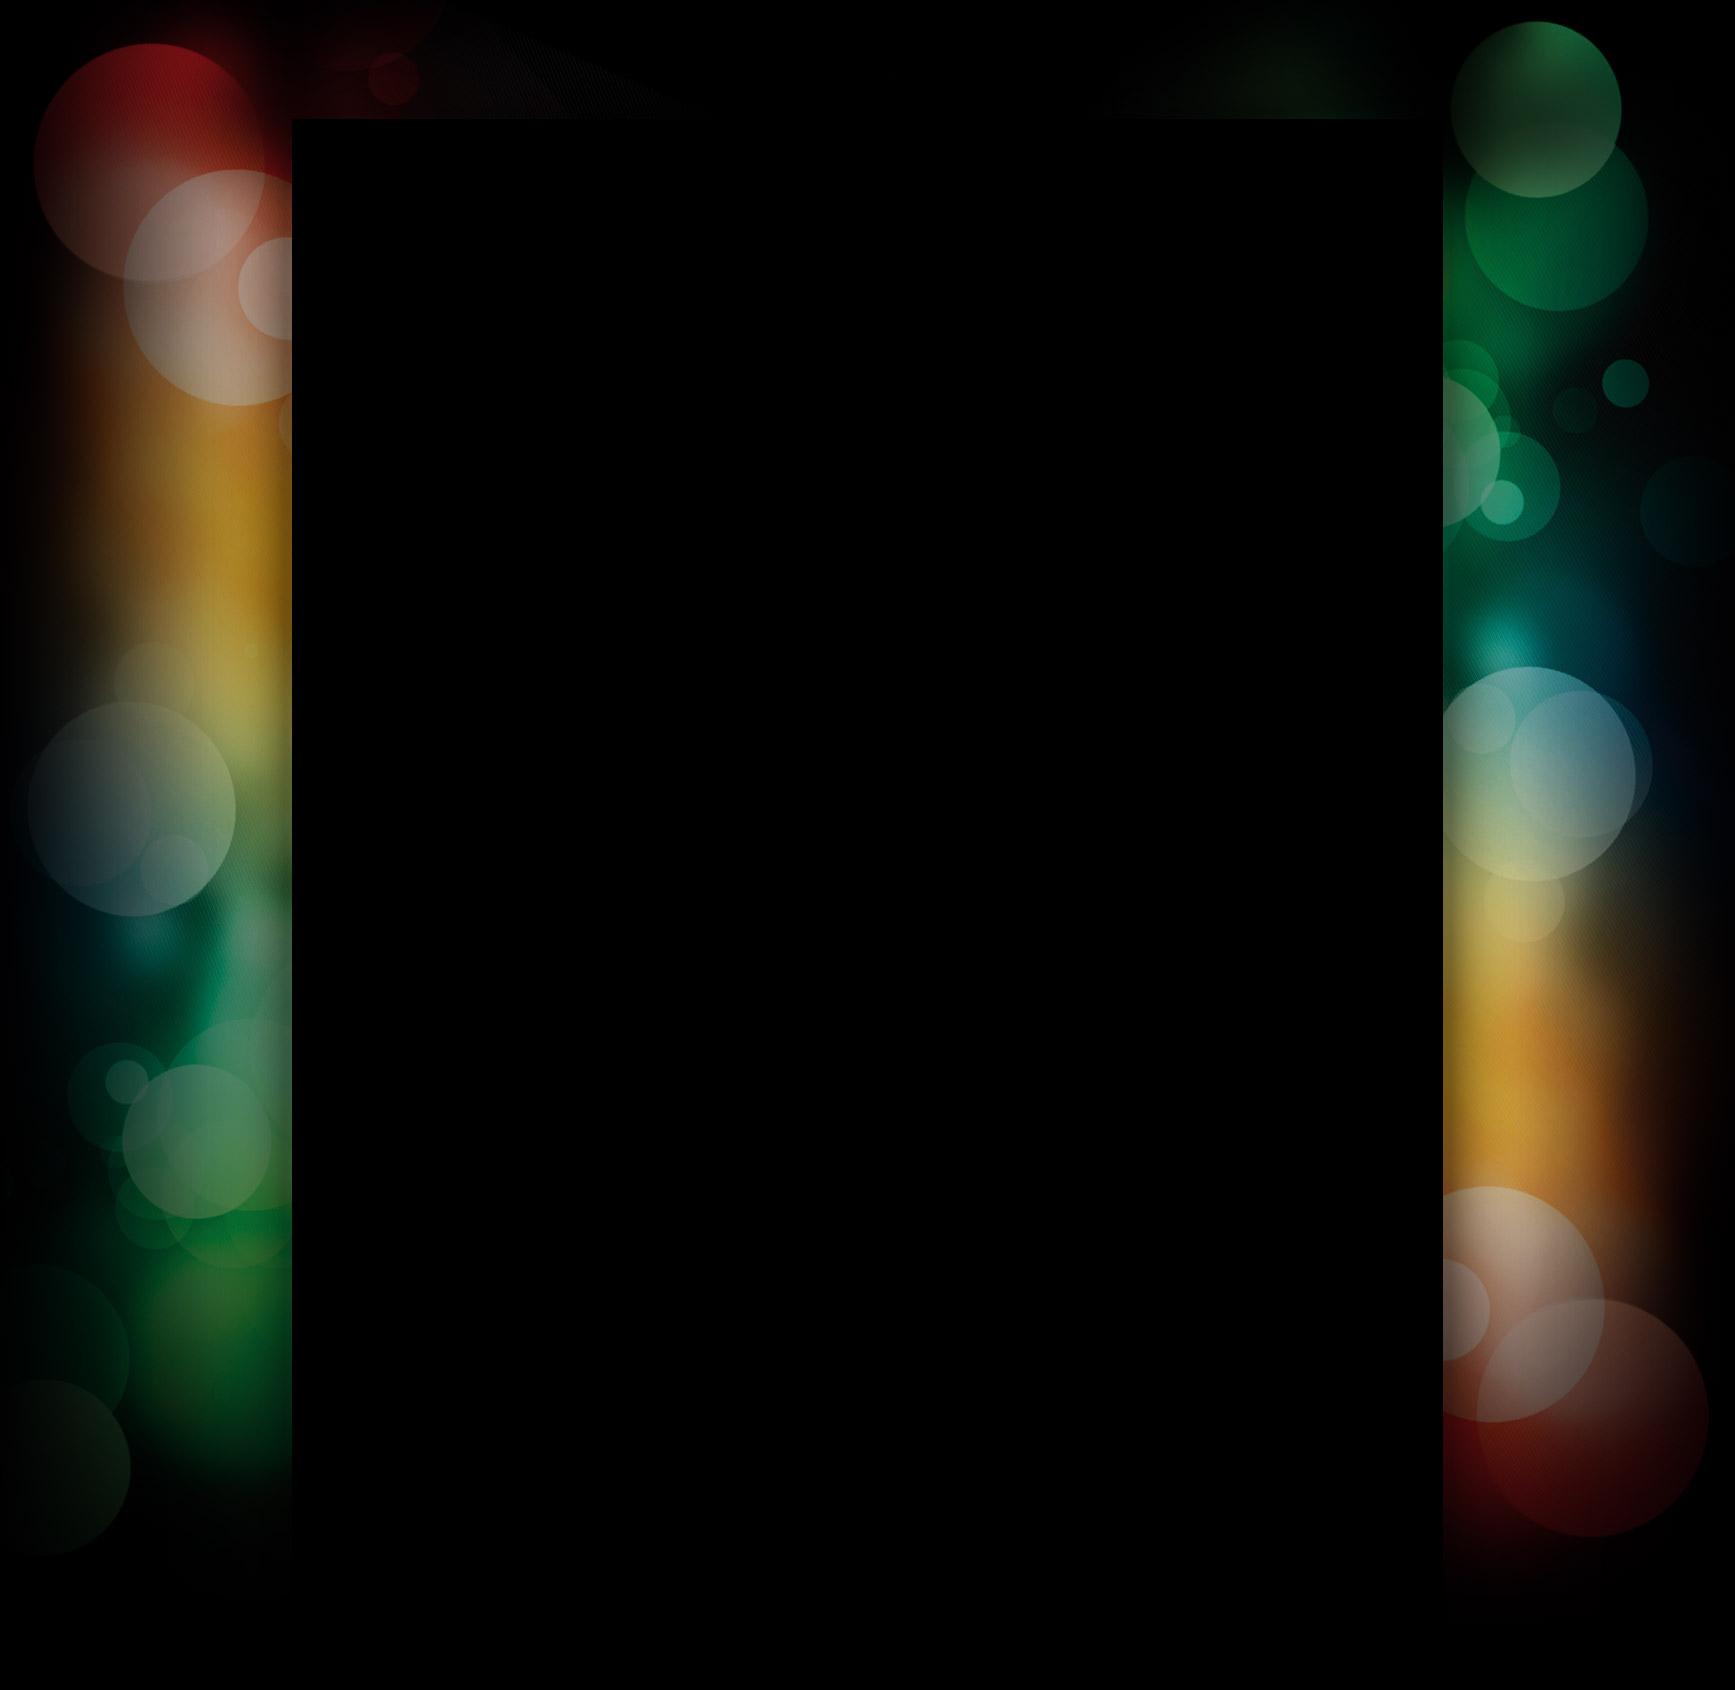 playbill-background-newsi.jpg